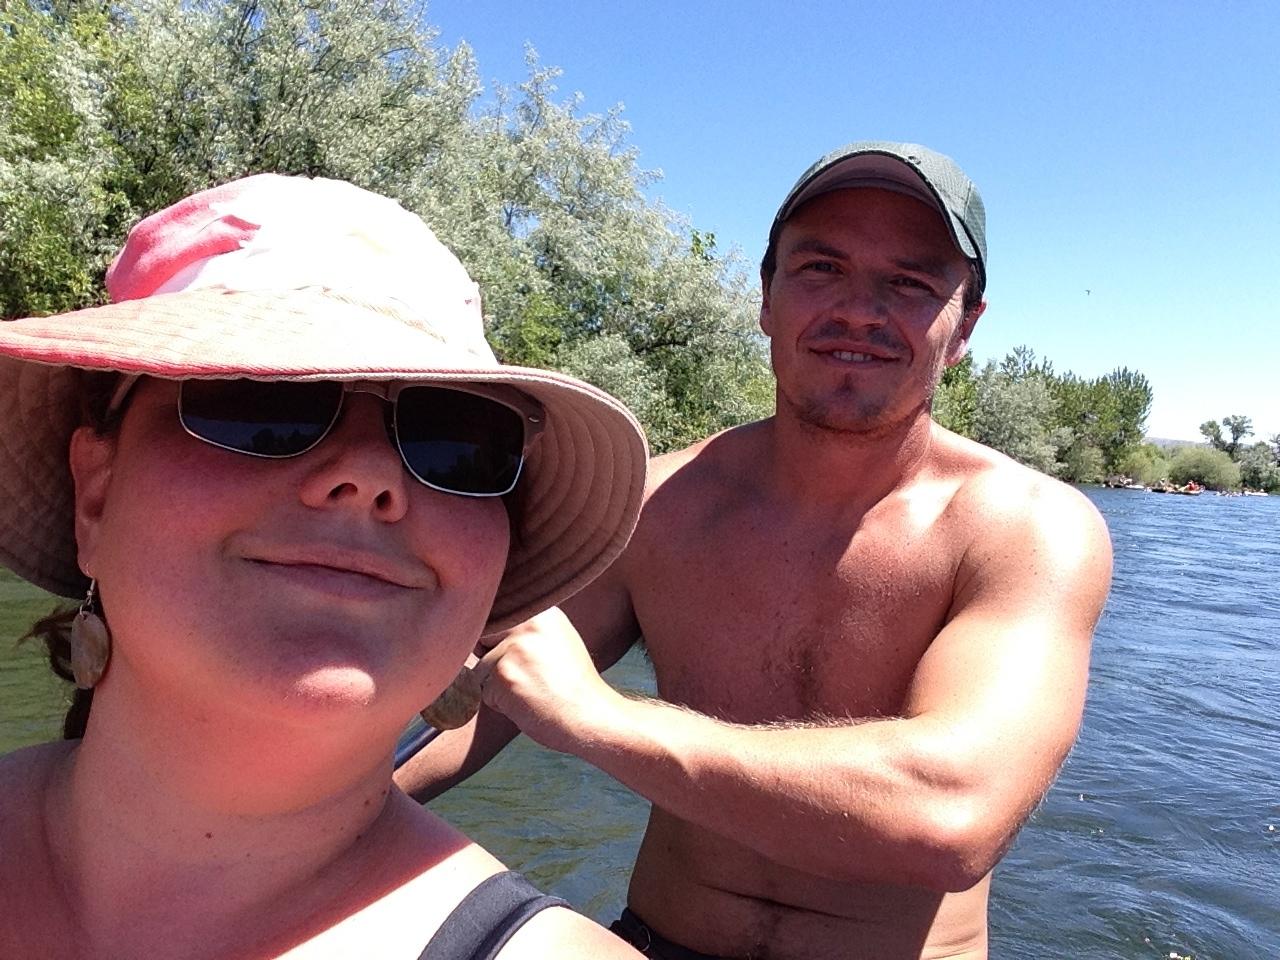 My Nicholas and I, kayaking in Idaho, 2014.